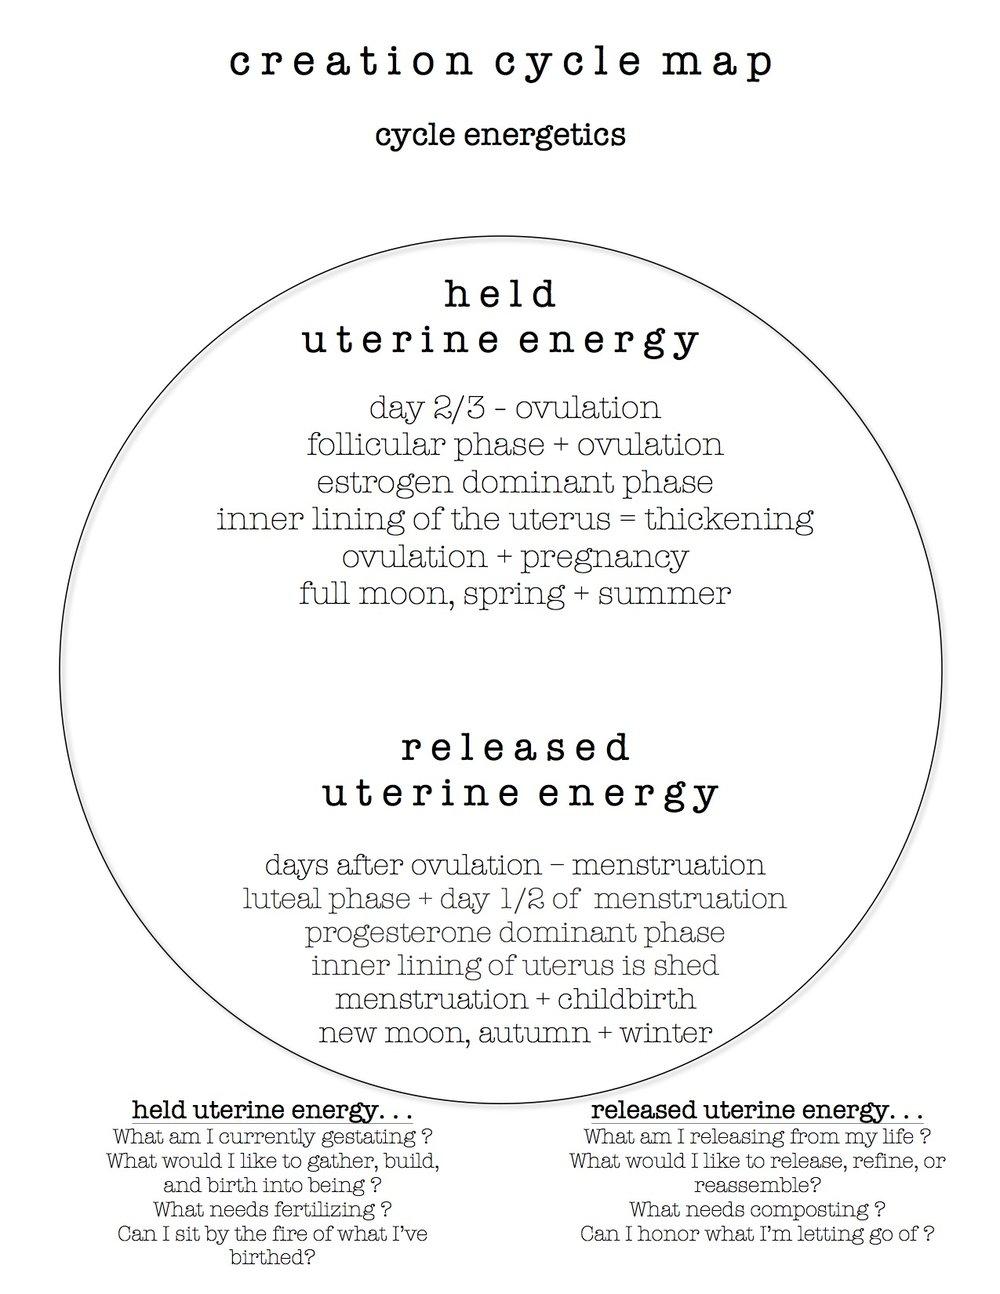 Creation Cycle Map.jpg